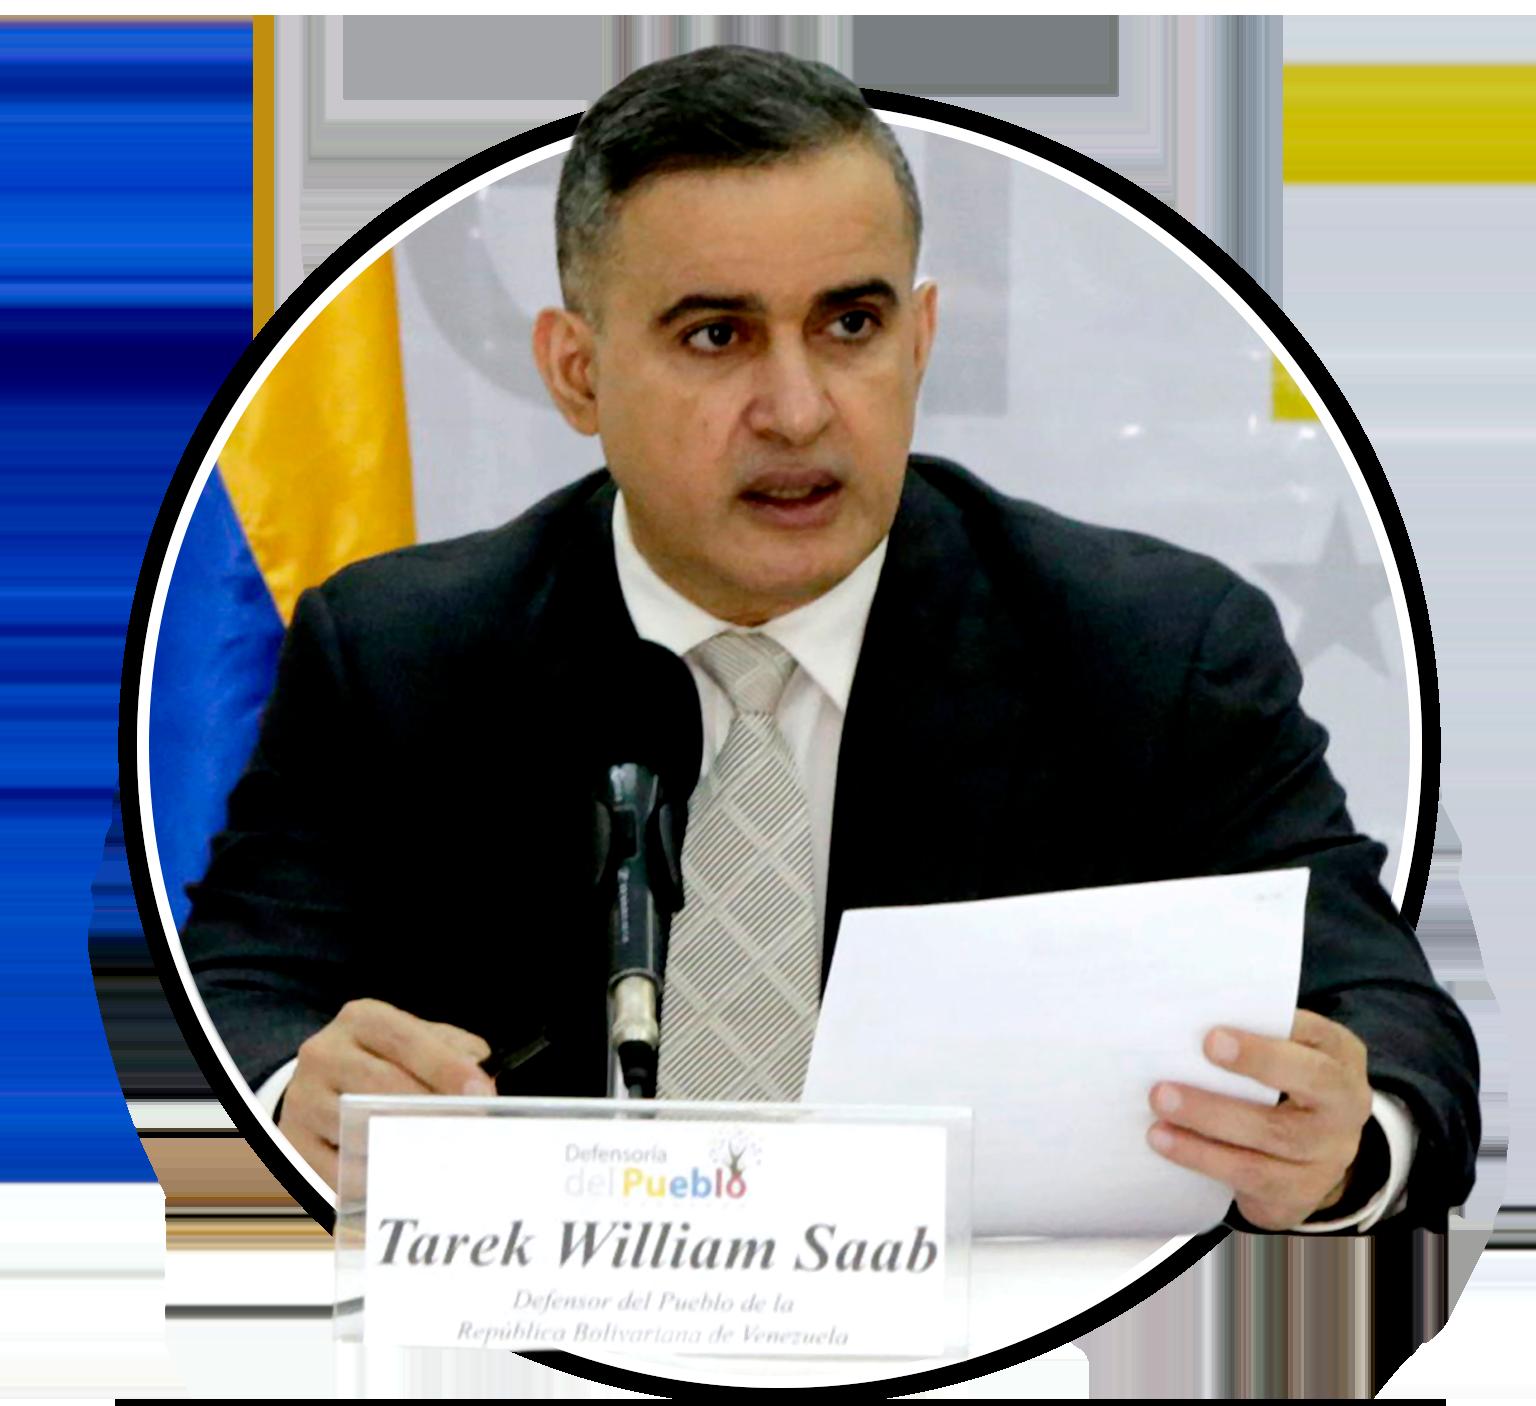 Tarek William Saab Trayectoria